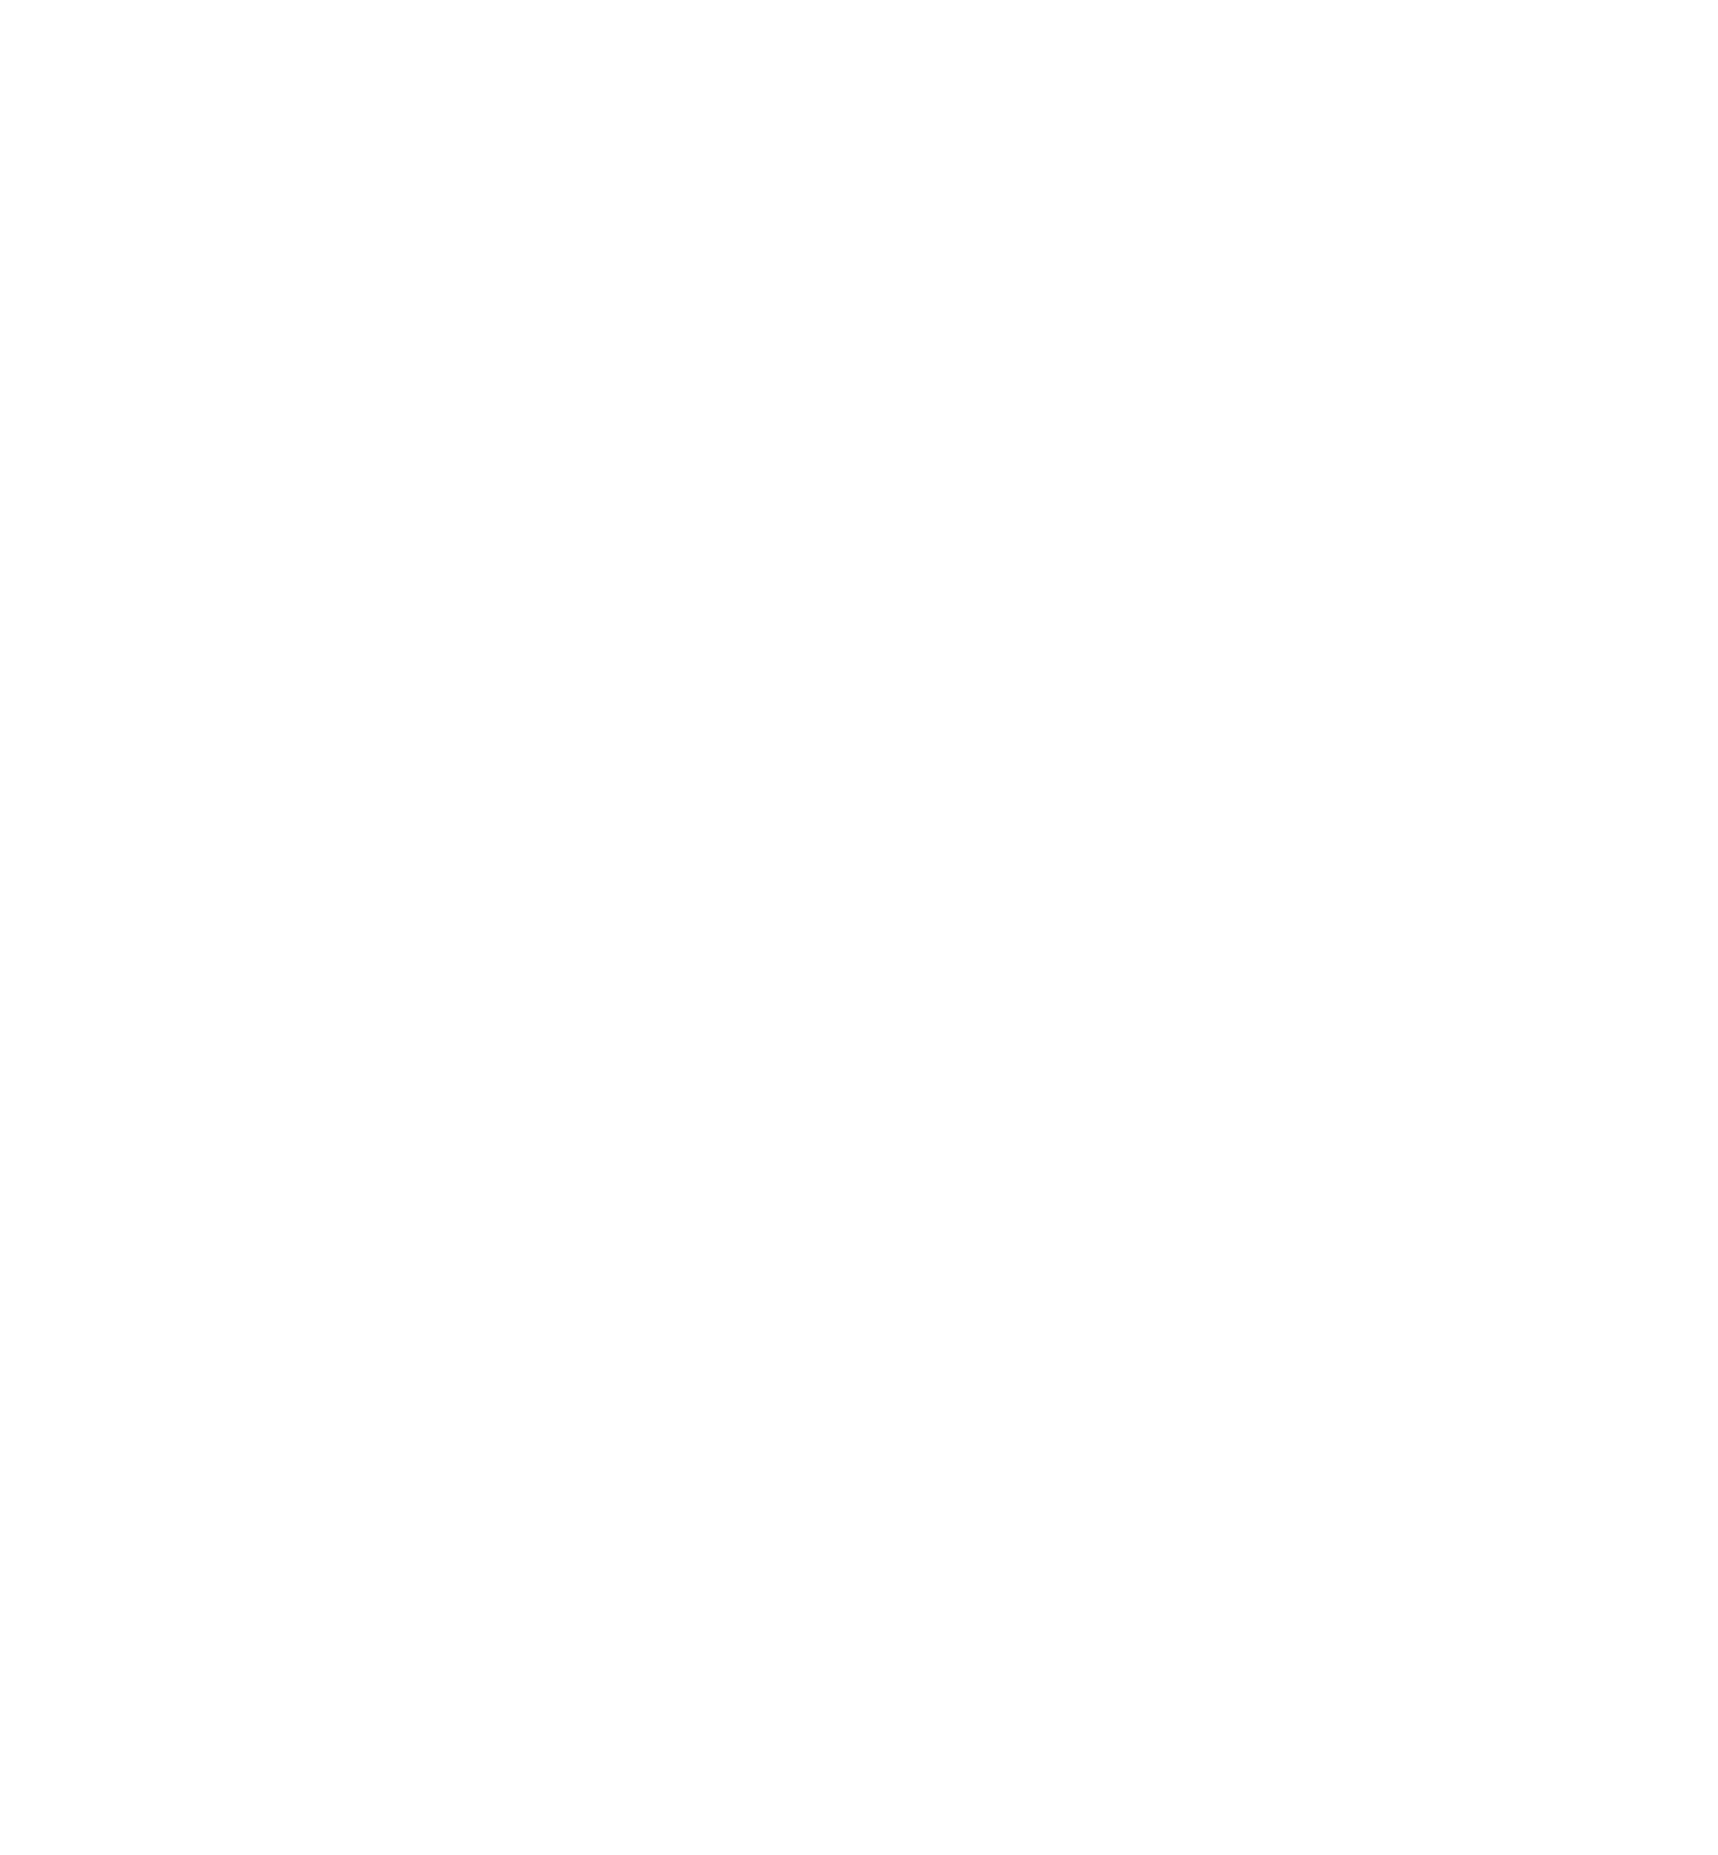 Apex Group logo image